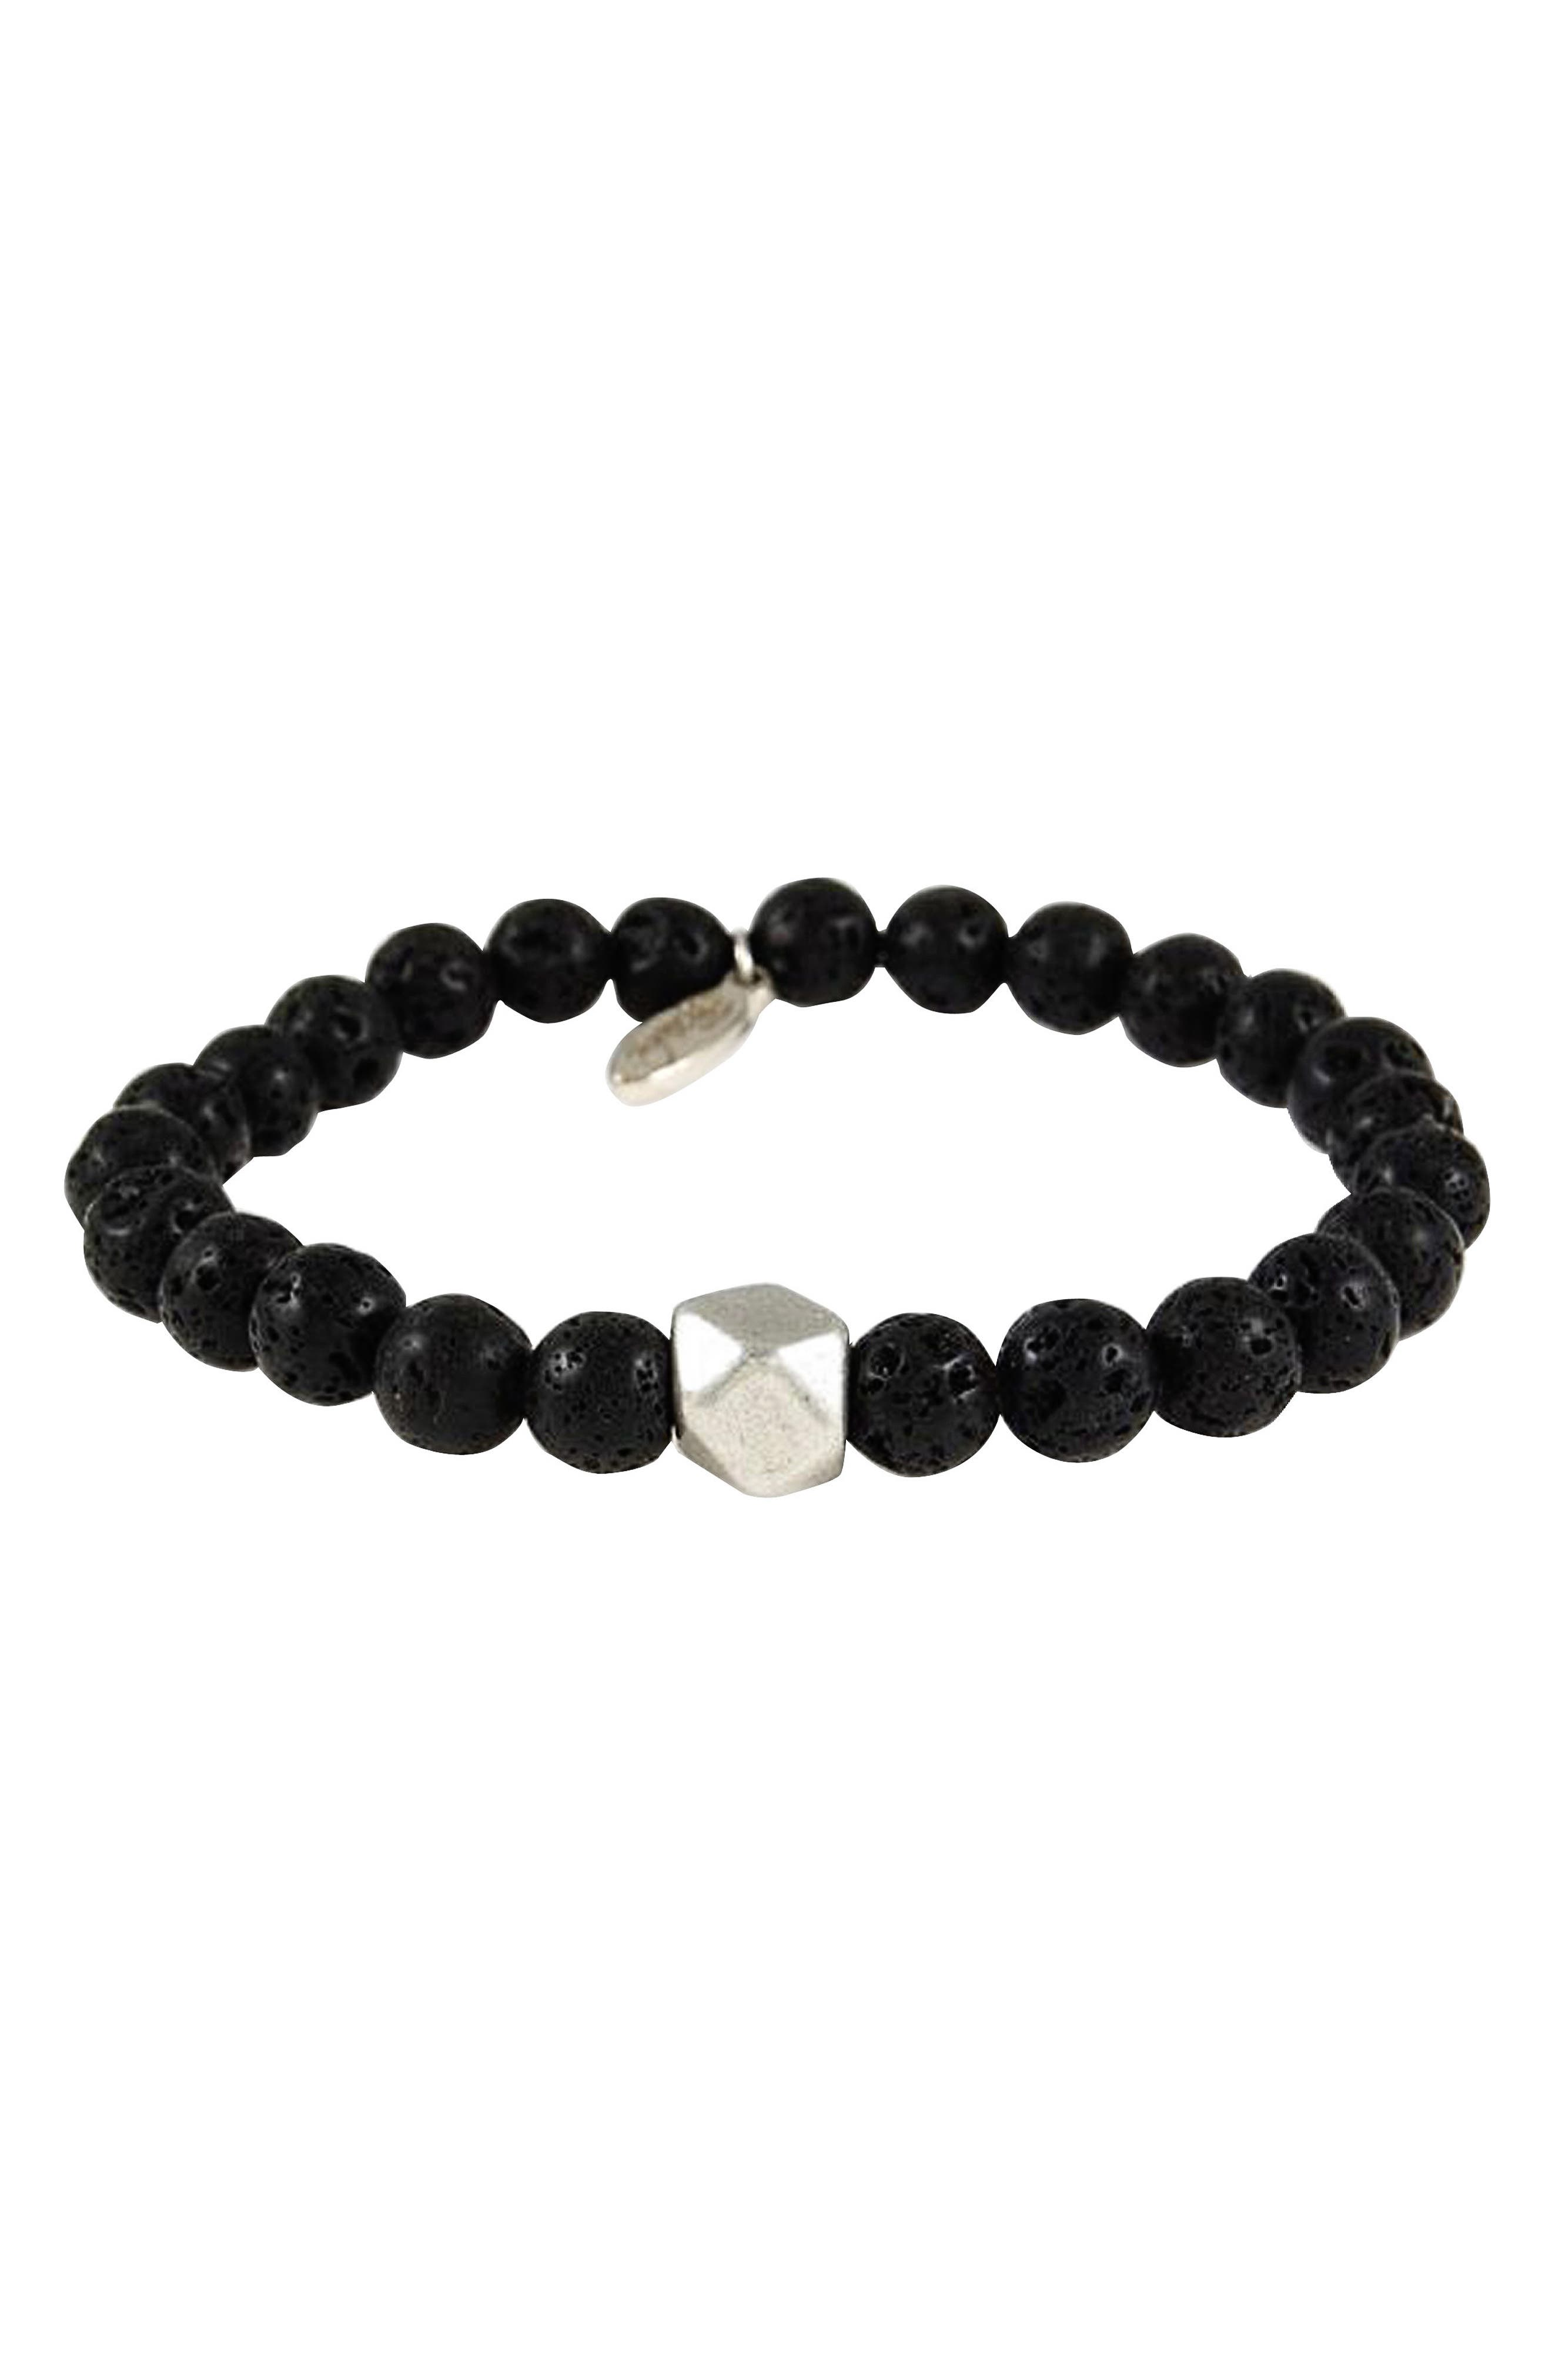 Onyx Stretch Bracelet,                         Main,                         color, Black